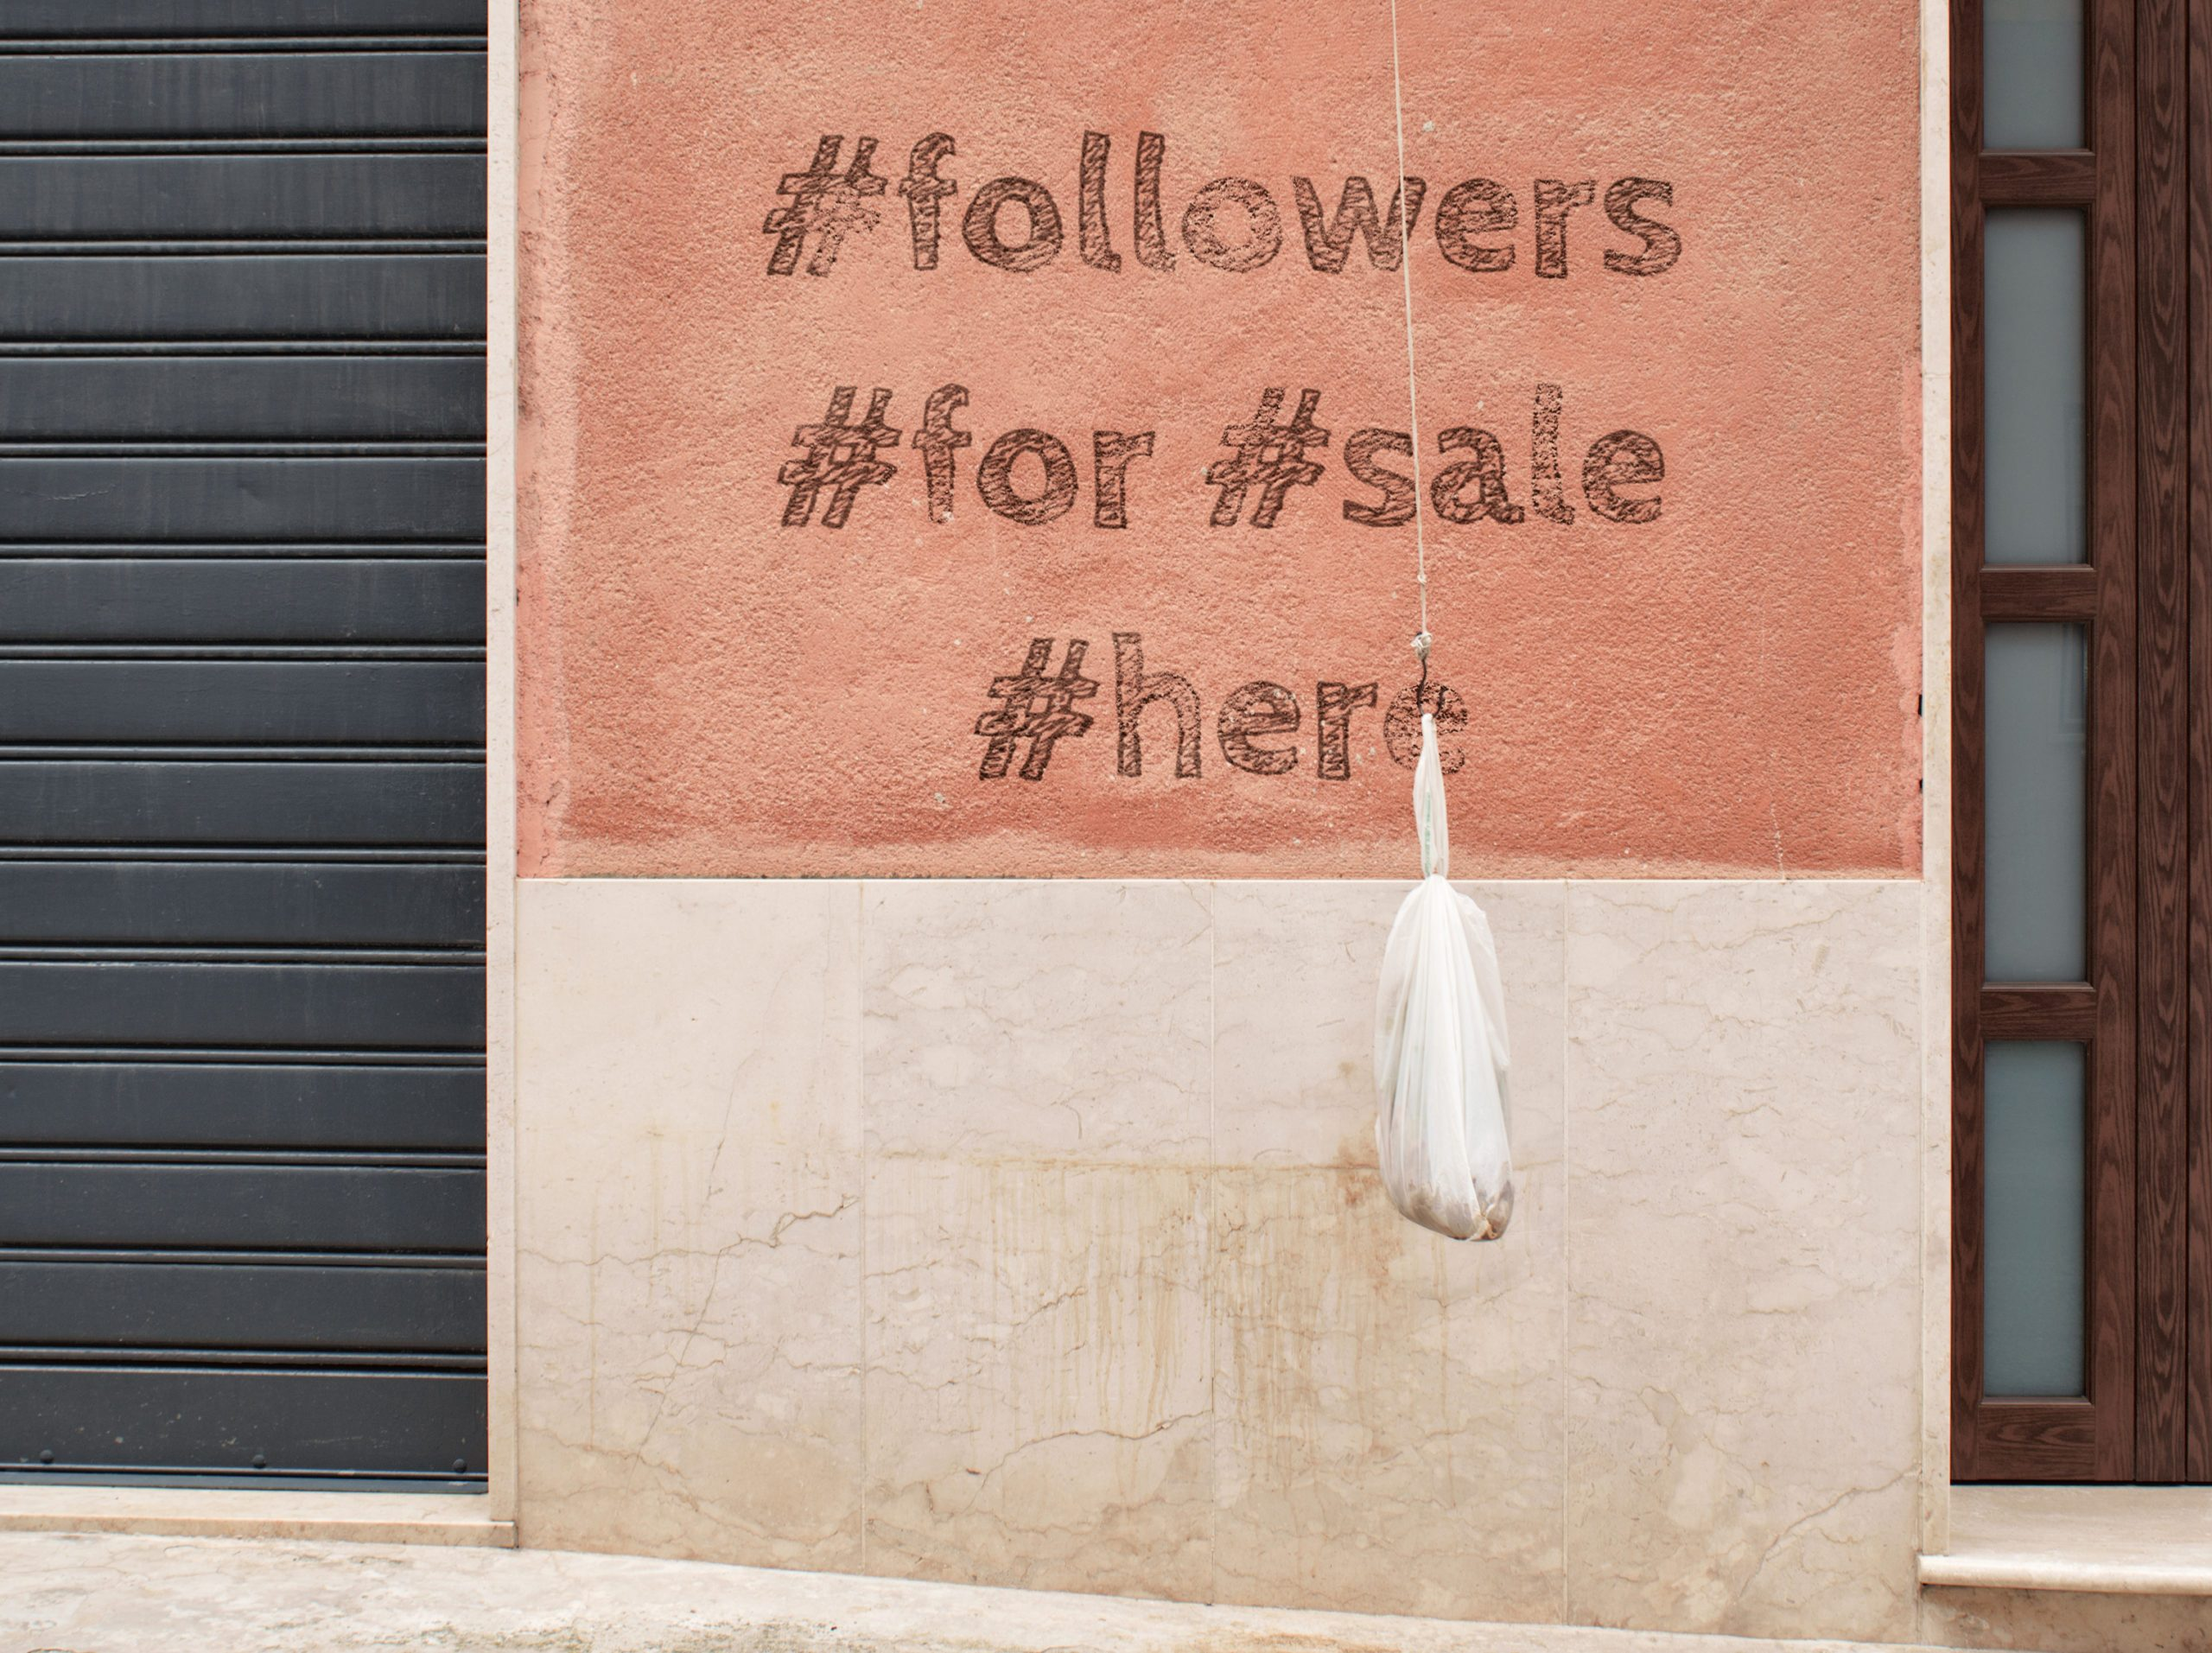 followers for social media for sale here